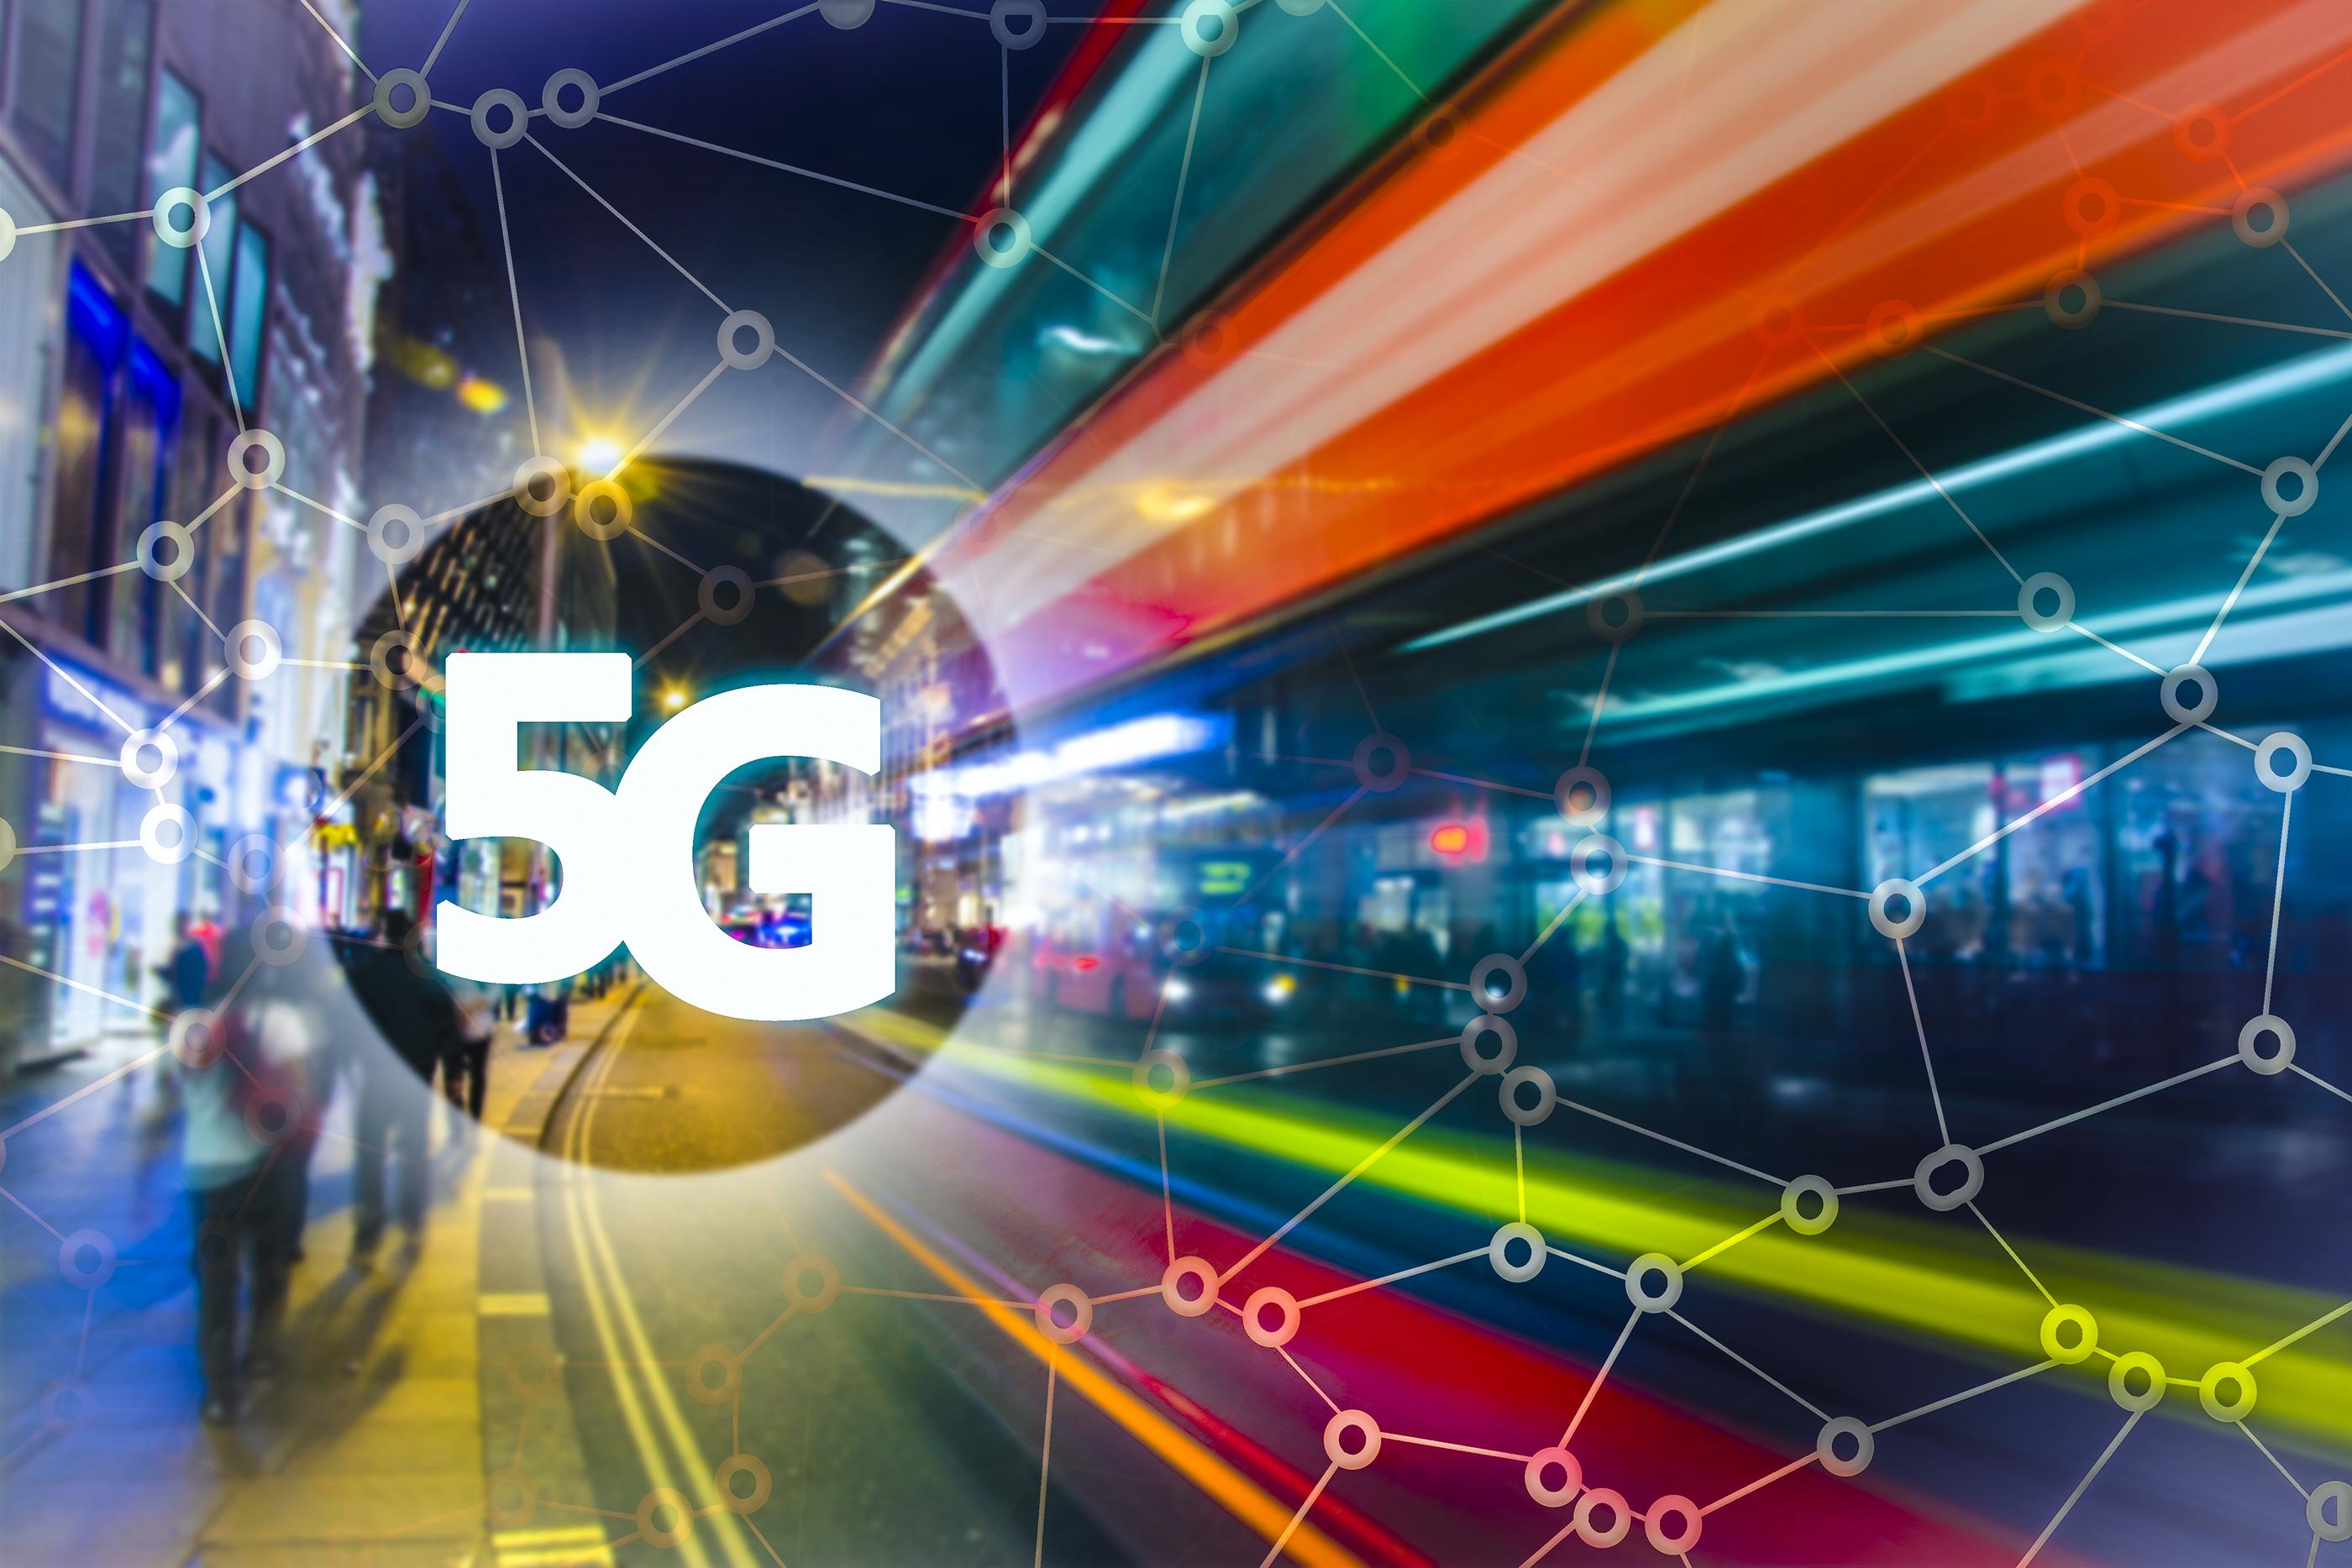 5G Market Comprehensive Study Explore Huge Growth in Future | AT&T, Vodafone, Deutsche Telekom